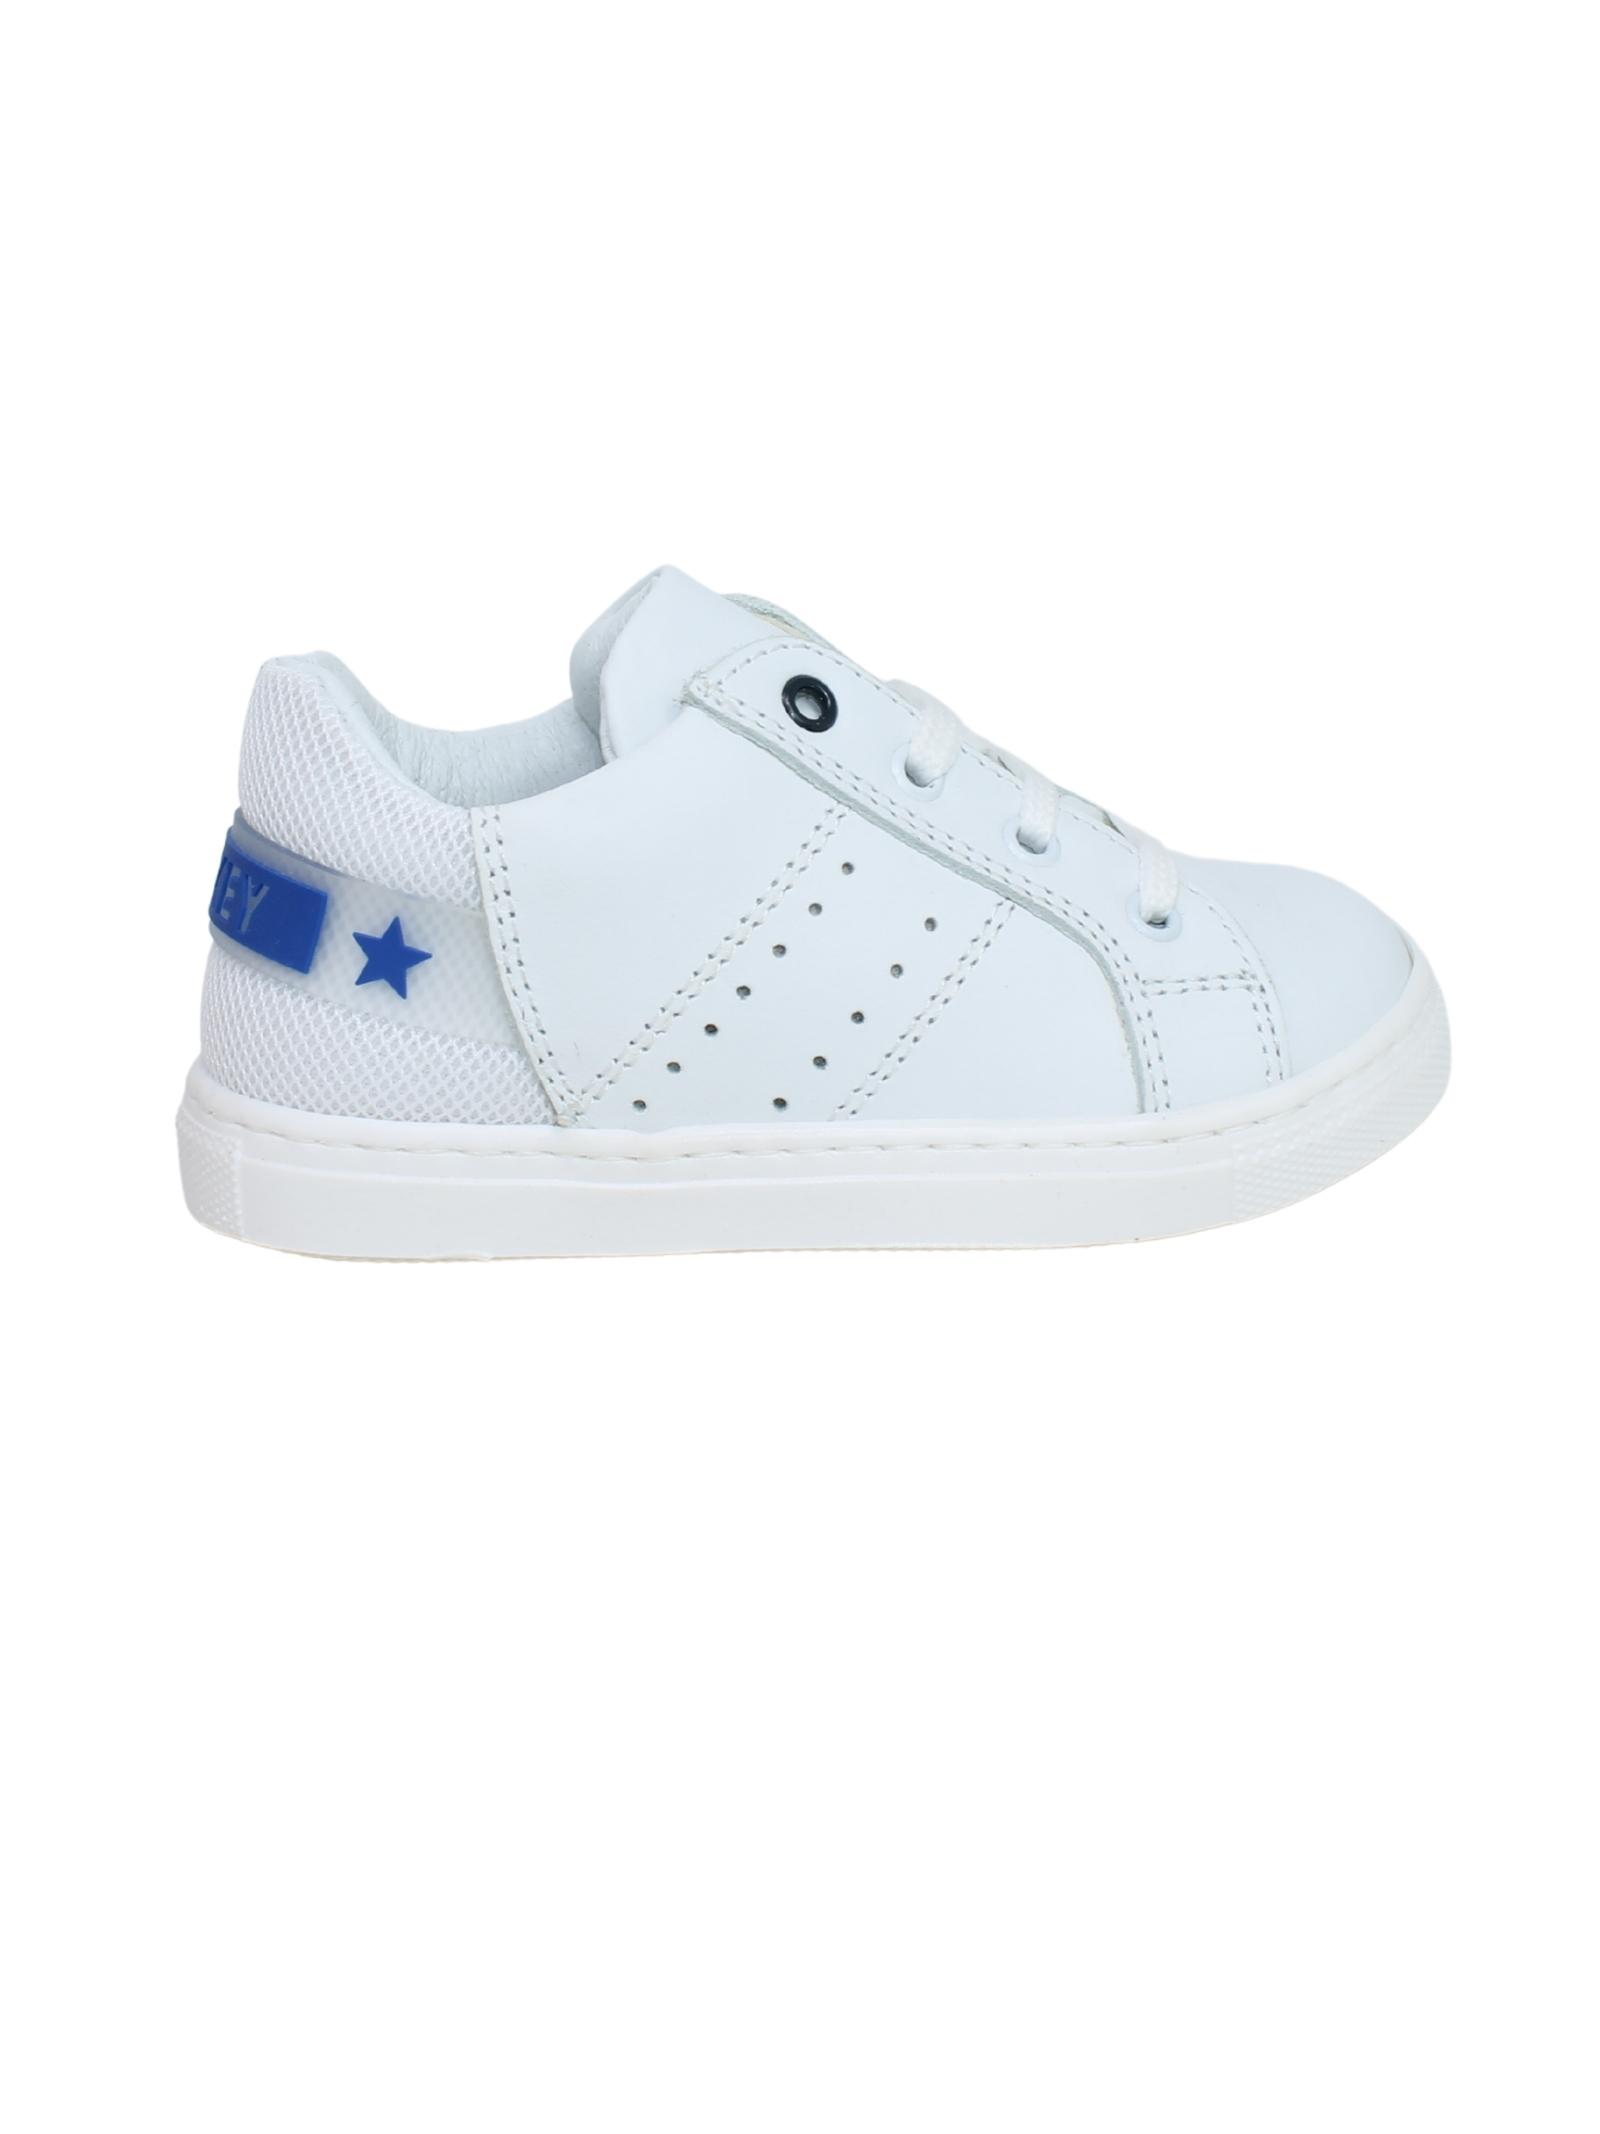 WALKEY | Sneakers | Y1B4406280030X004BIANCO